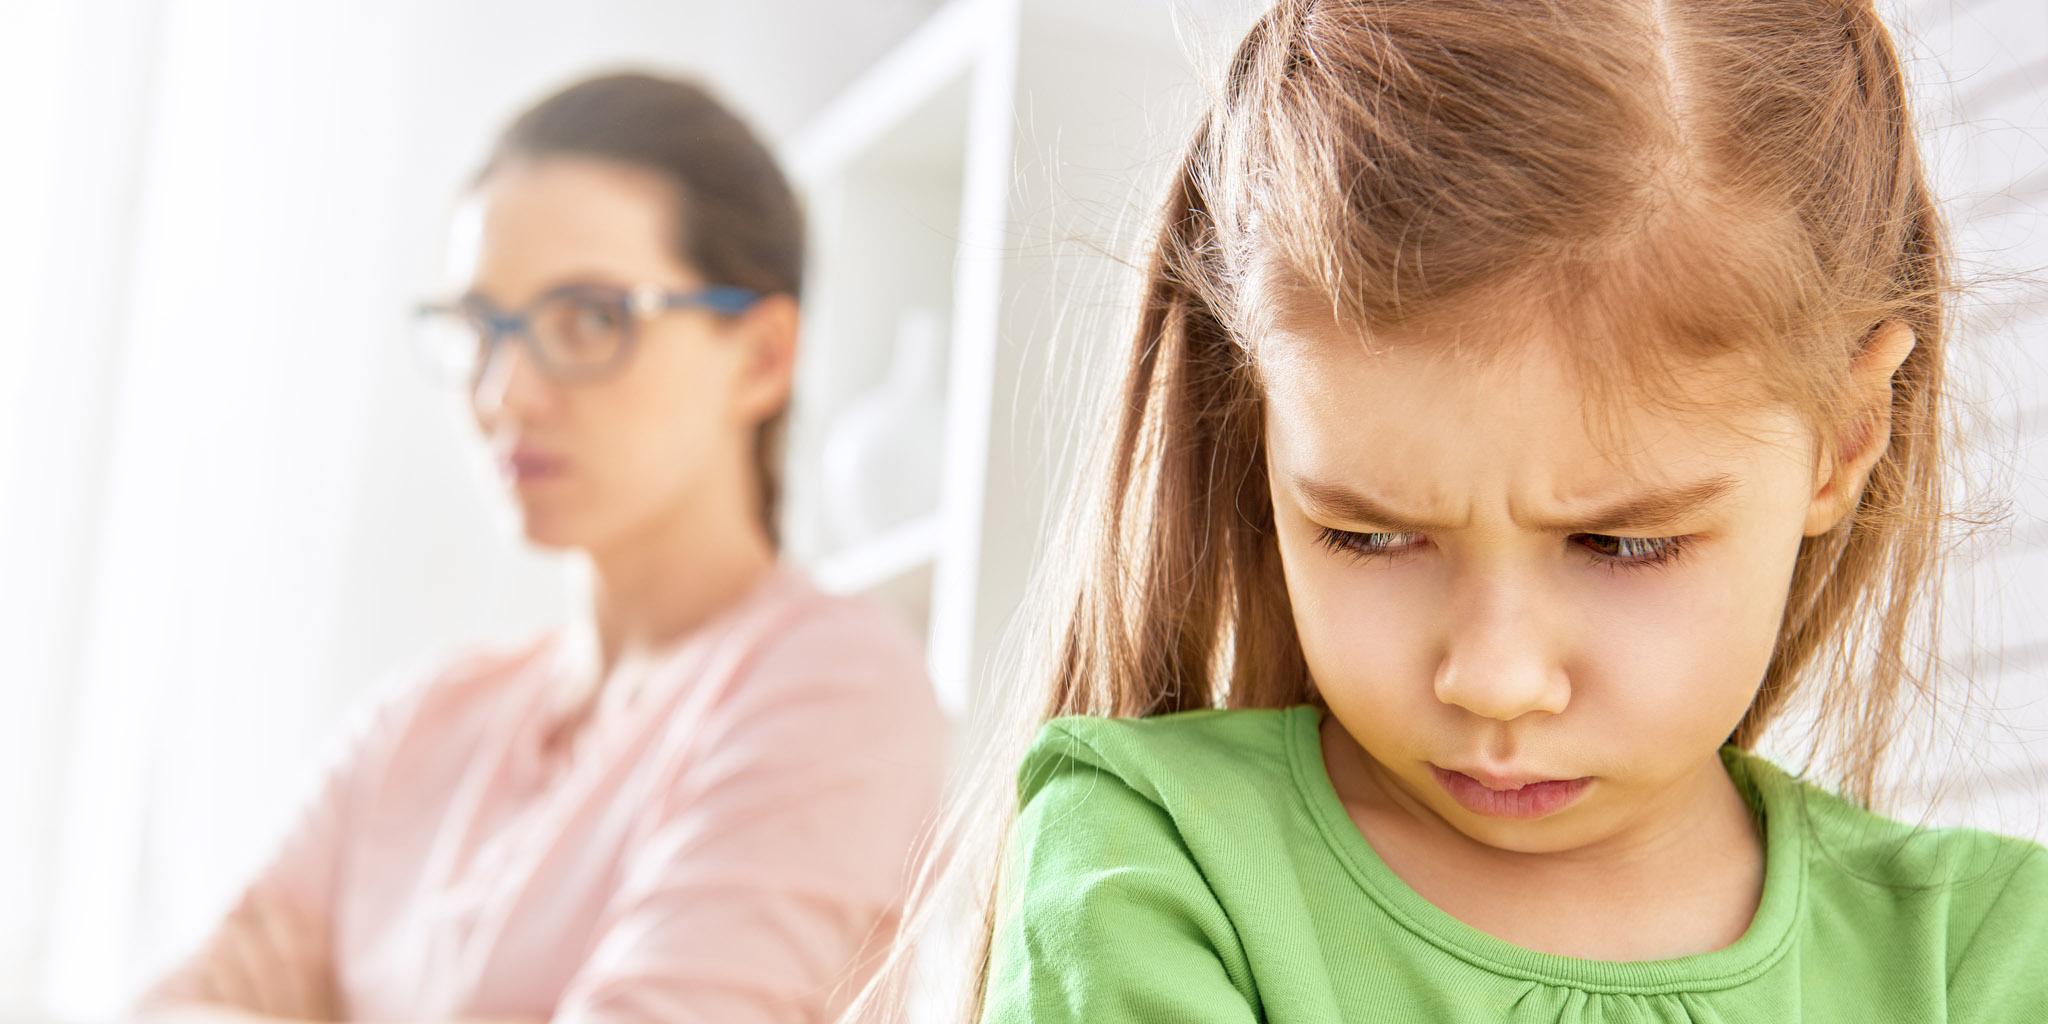 Varstvo ne poslušnega otroka